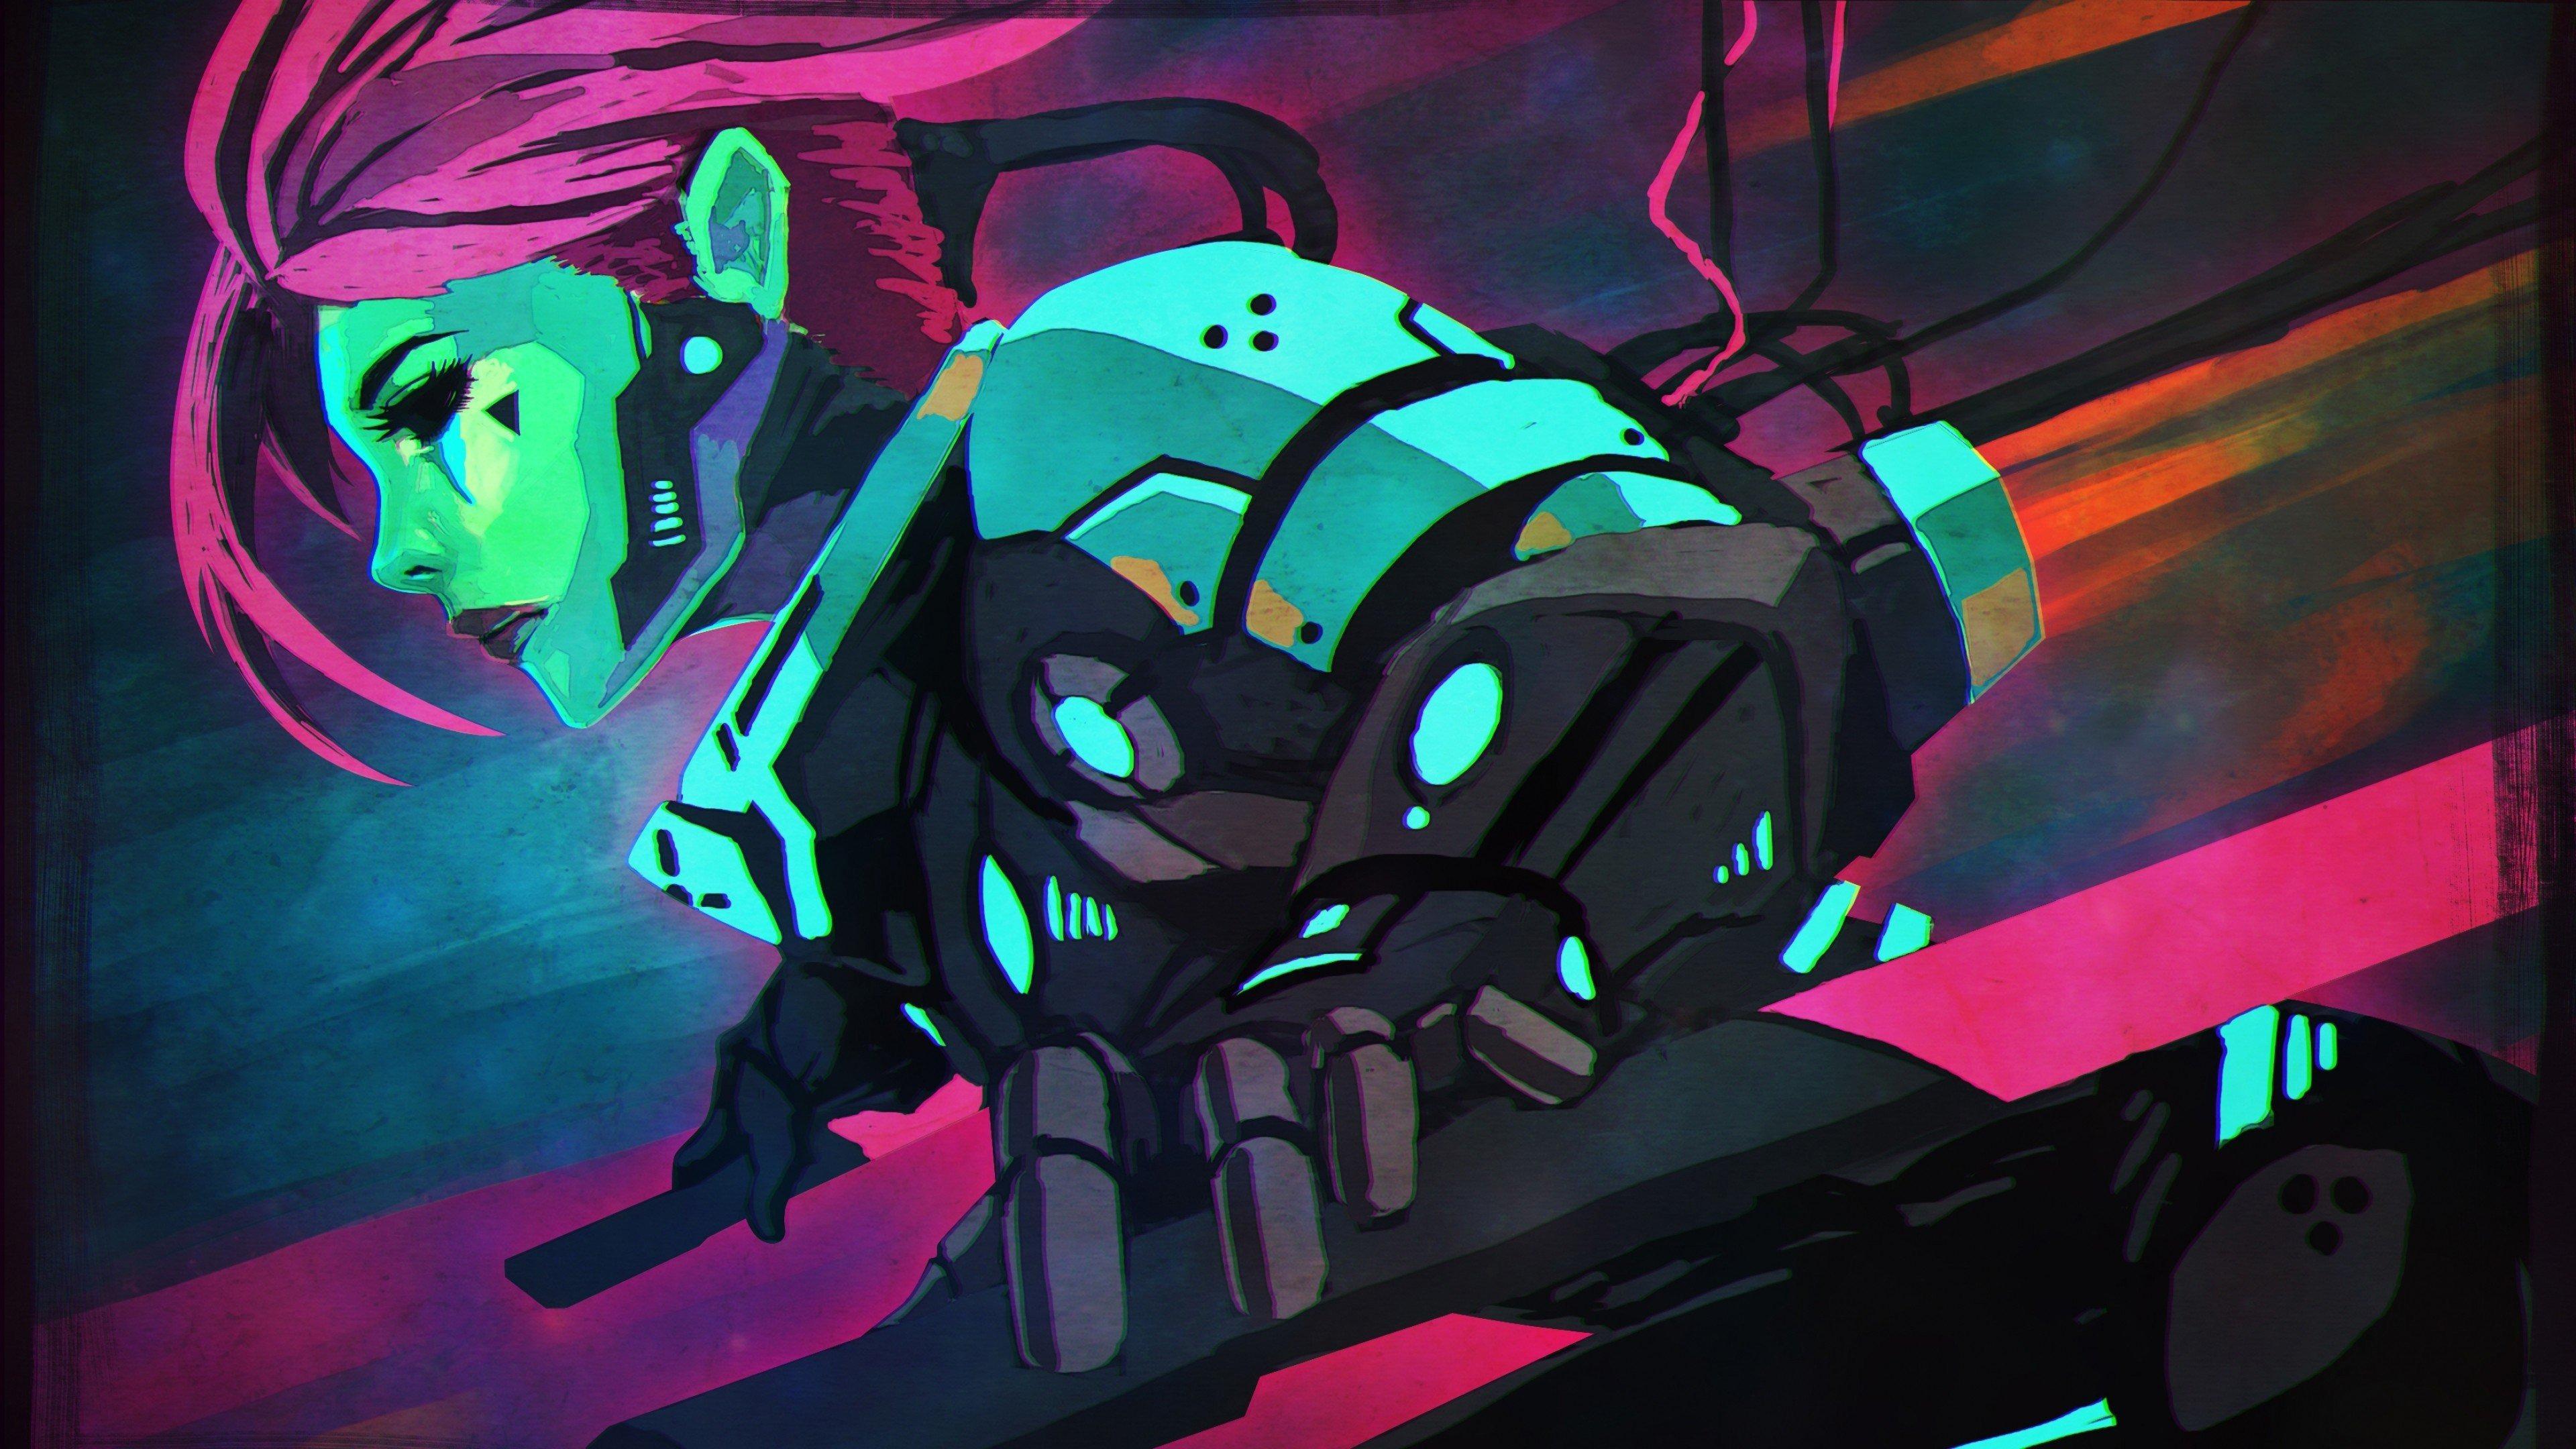 Cyberpunk Girl 4K UltraHD Wallpaper - backiee - Free Ultra ...